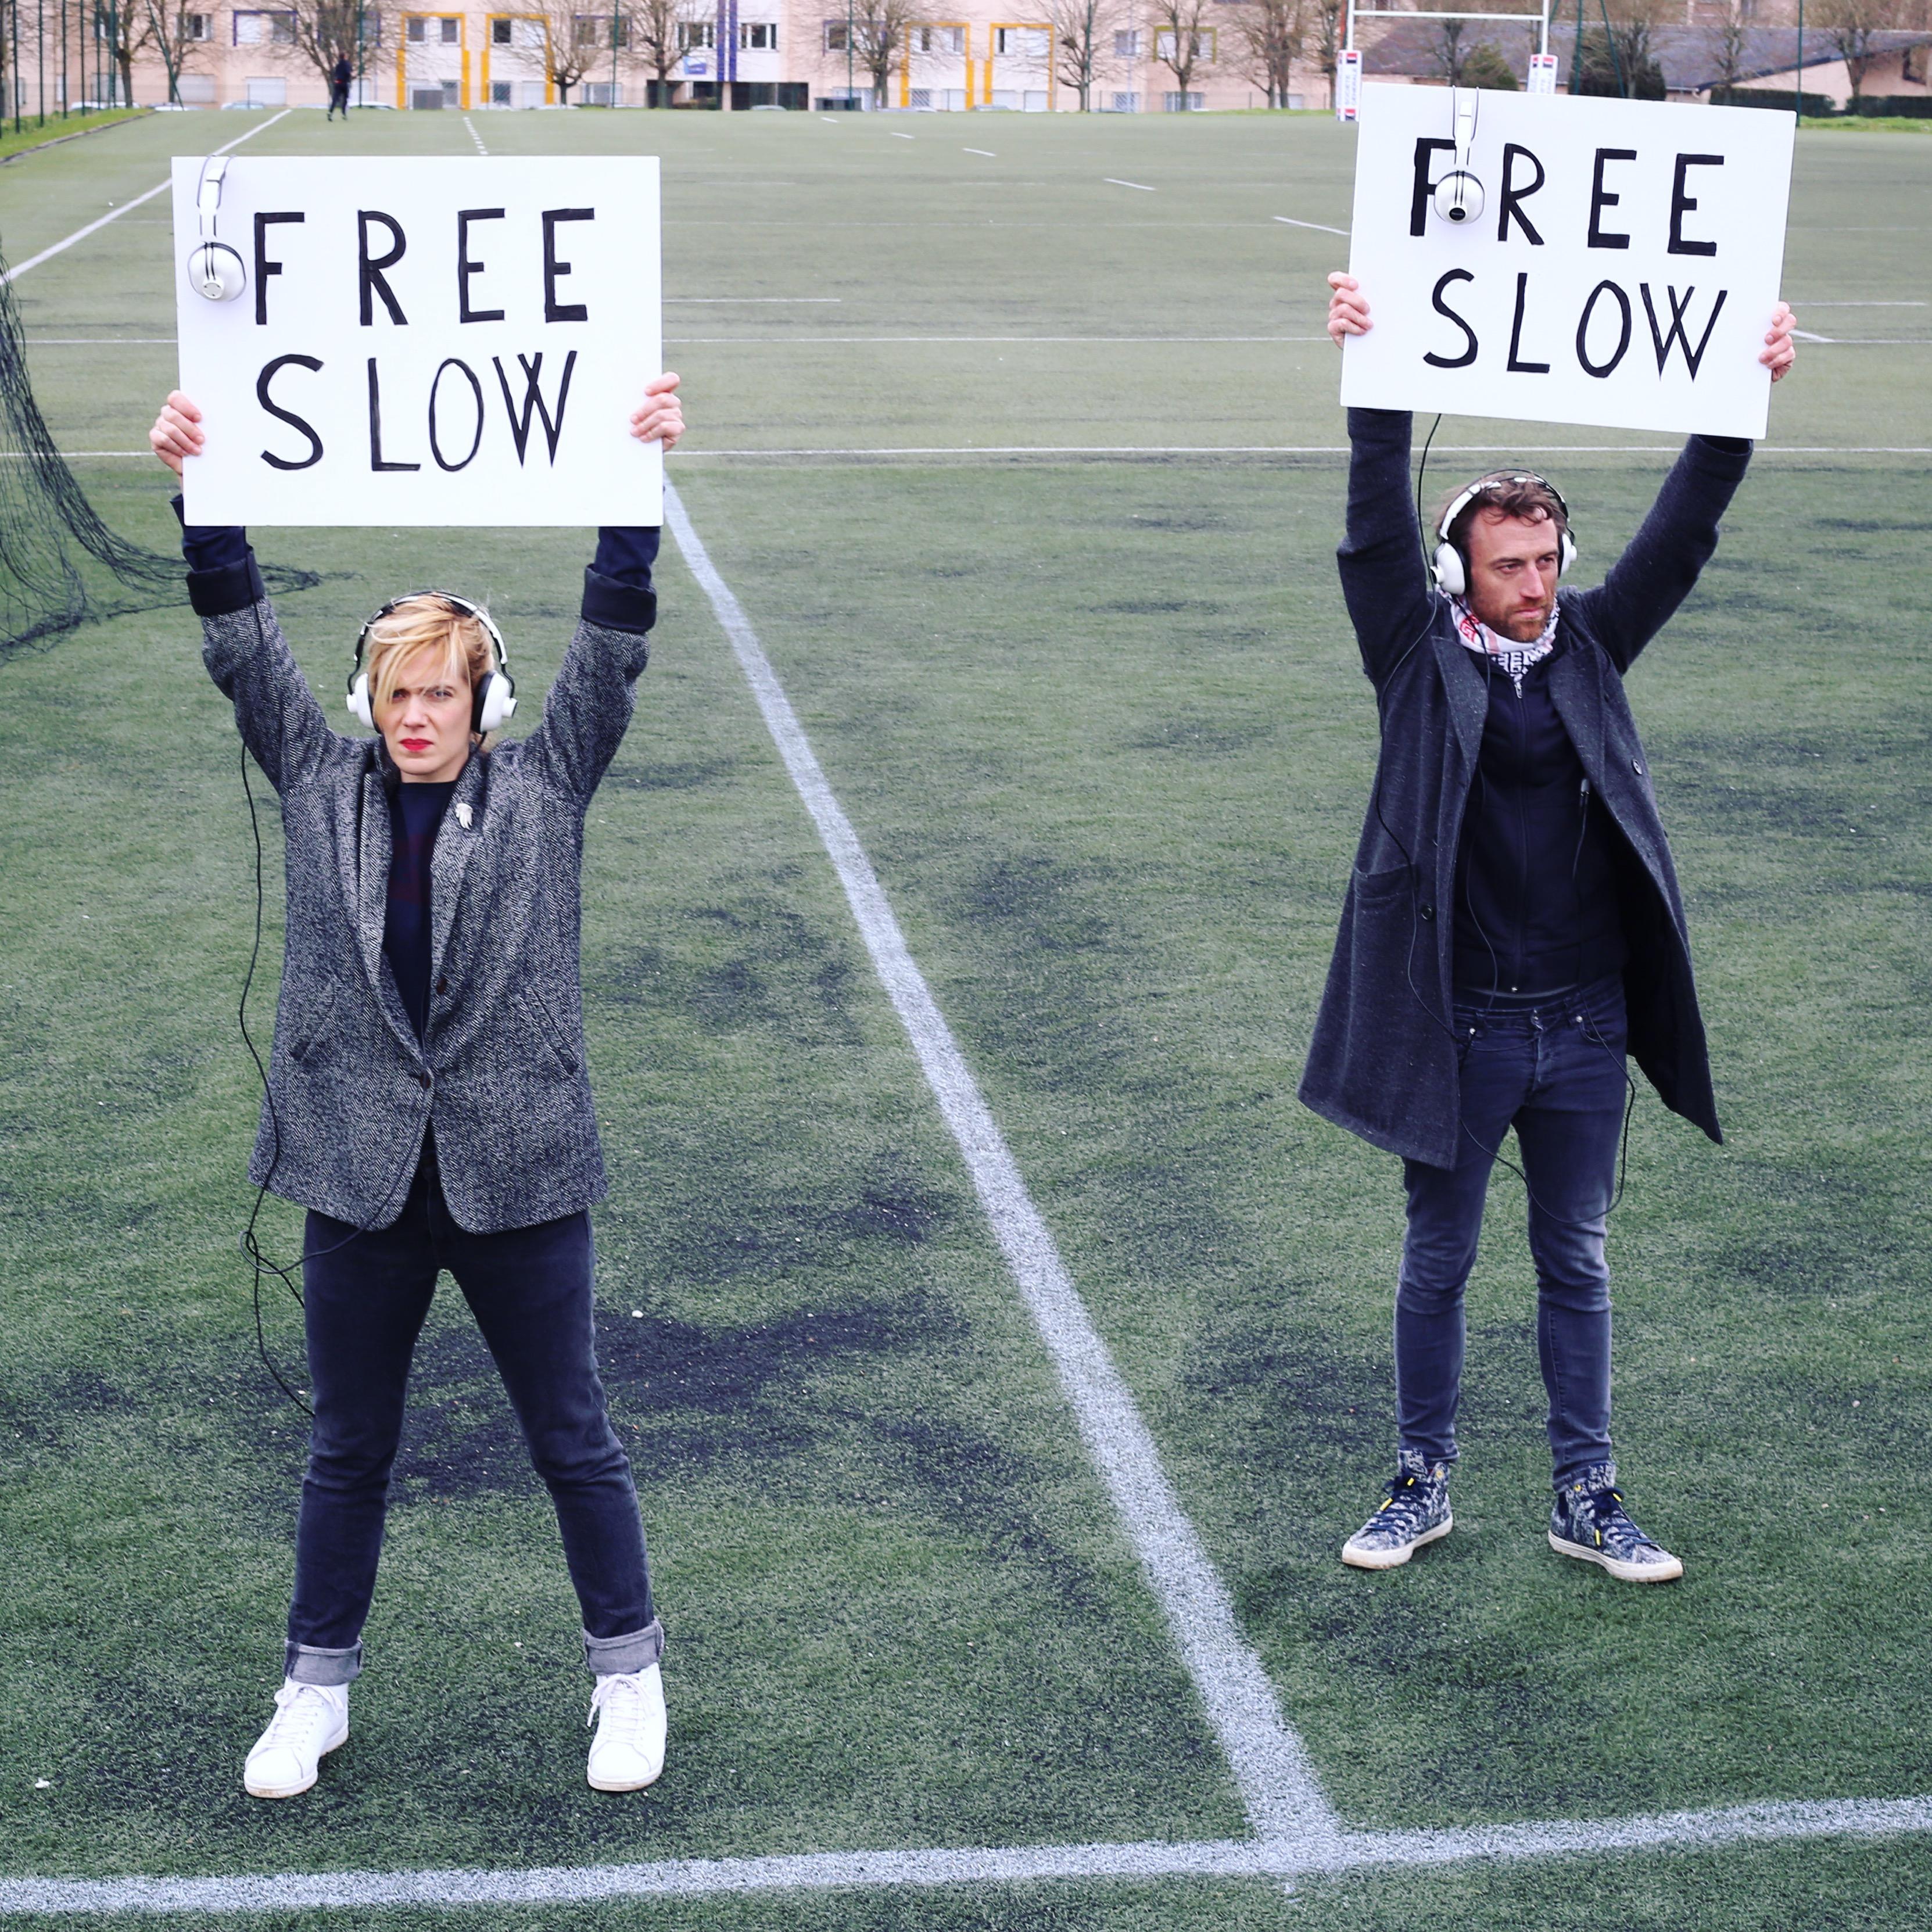 Free slow ©charlotteRousseau 29.3.18